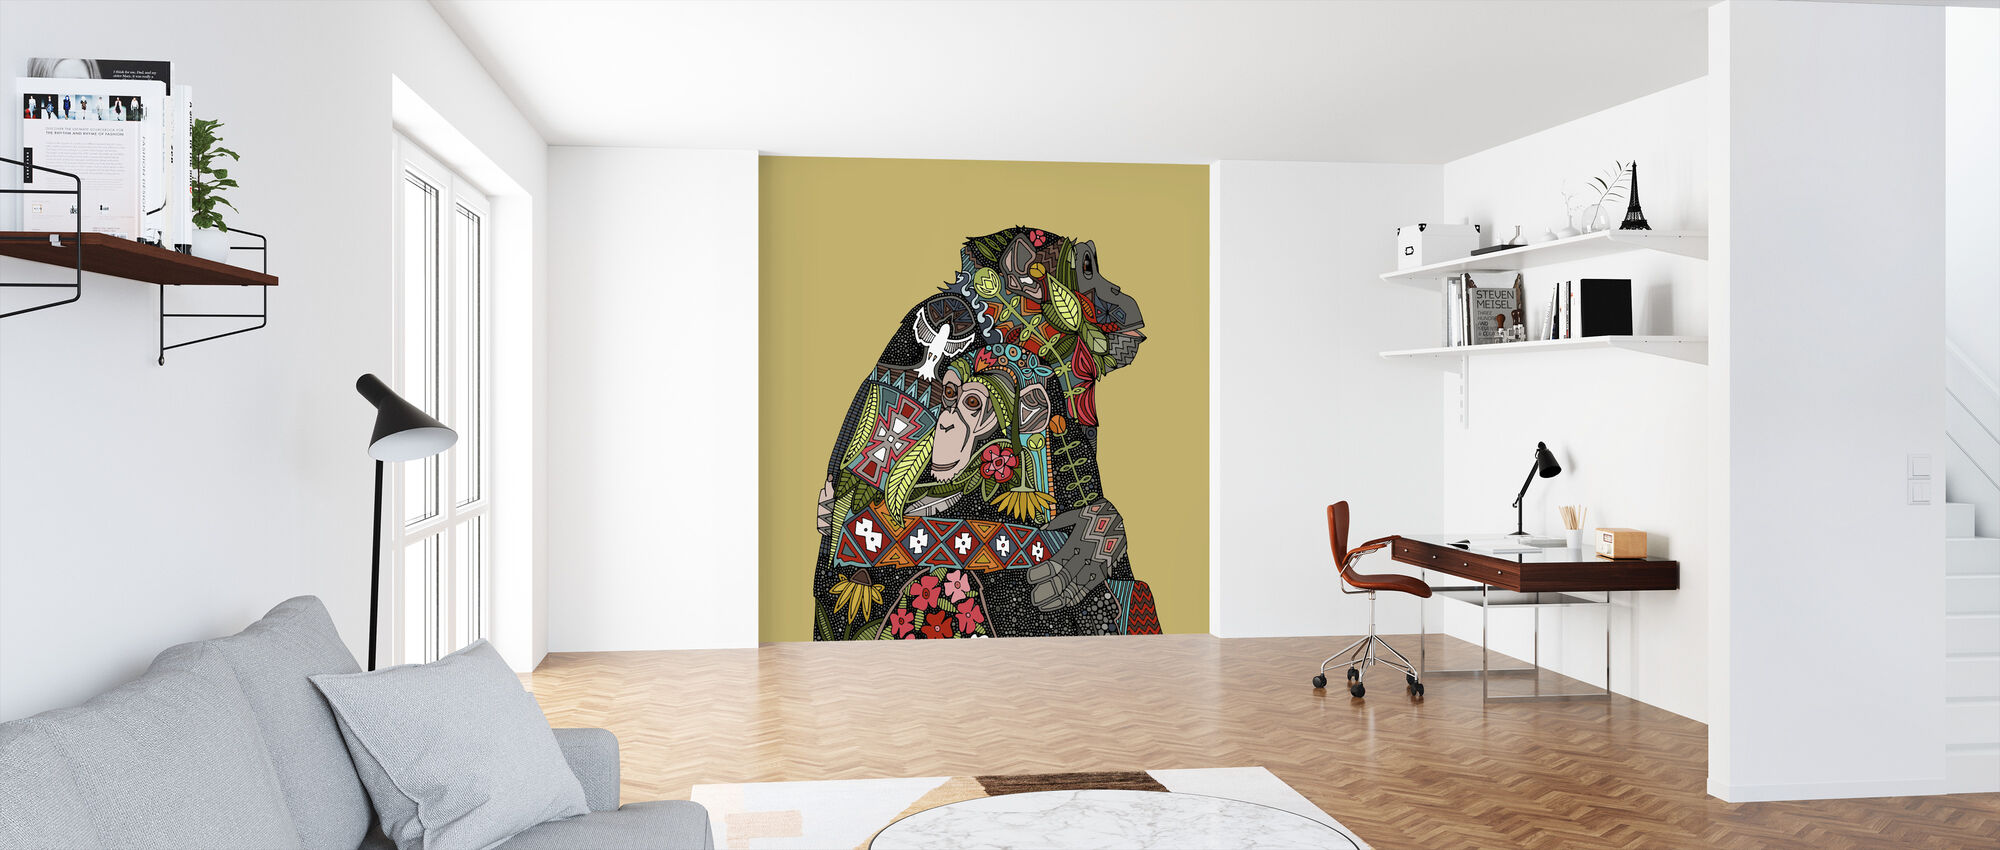 Chimpanzee Love Biscuit - Wallpaper - Office